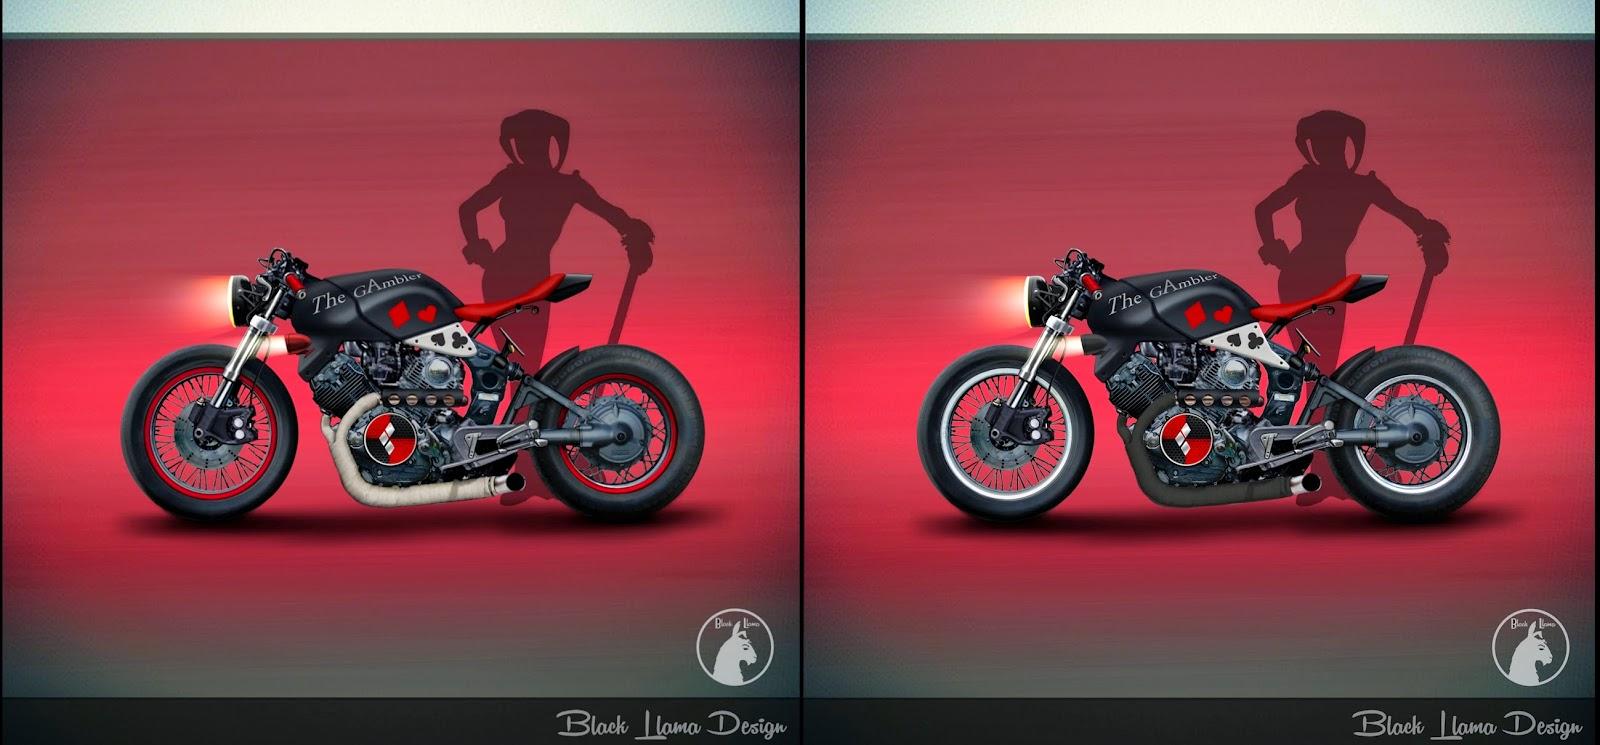 LuisPeñaSketching: Harley Quinn motorcycle, THE GAMBLER CAFE RACER